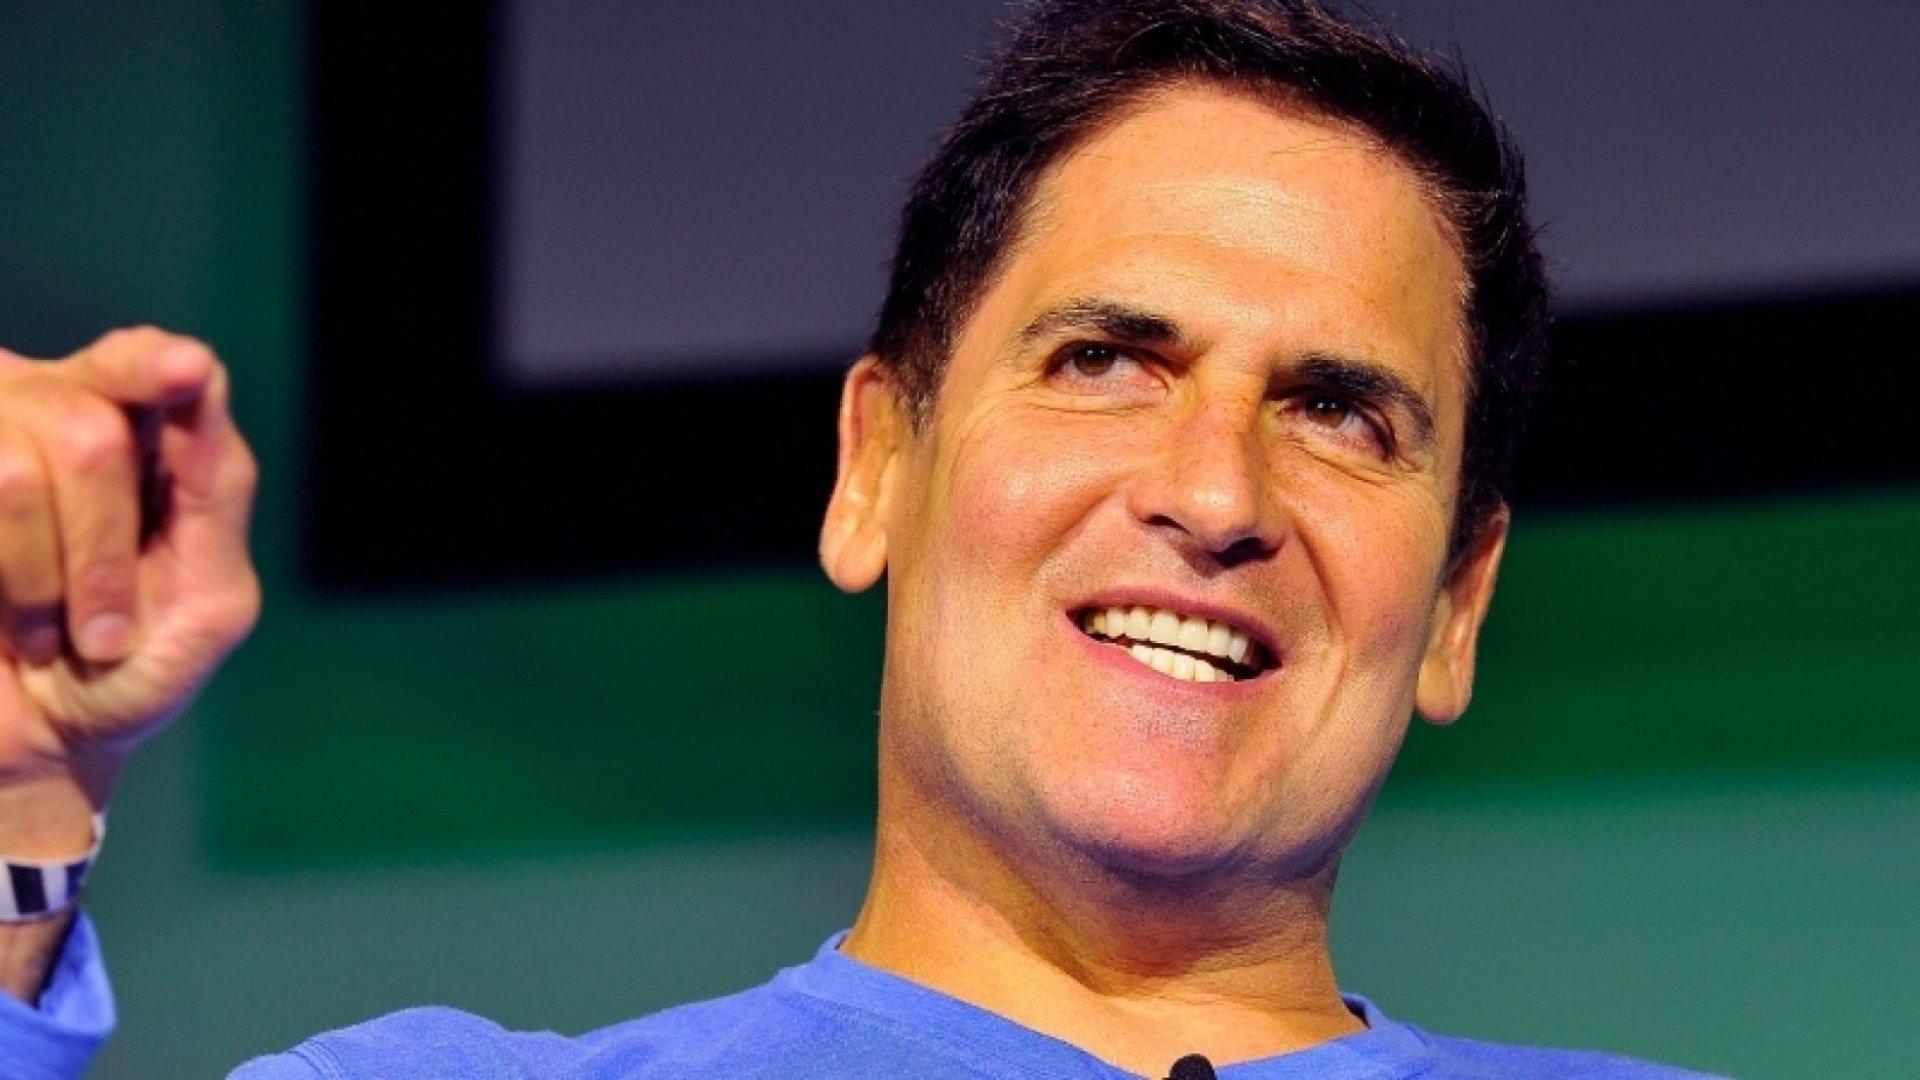 Billionaire Mark Cuban's Unusual Tech Investment Strategy